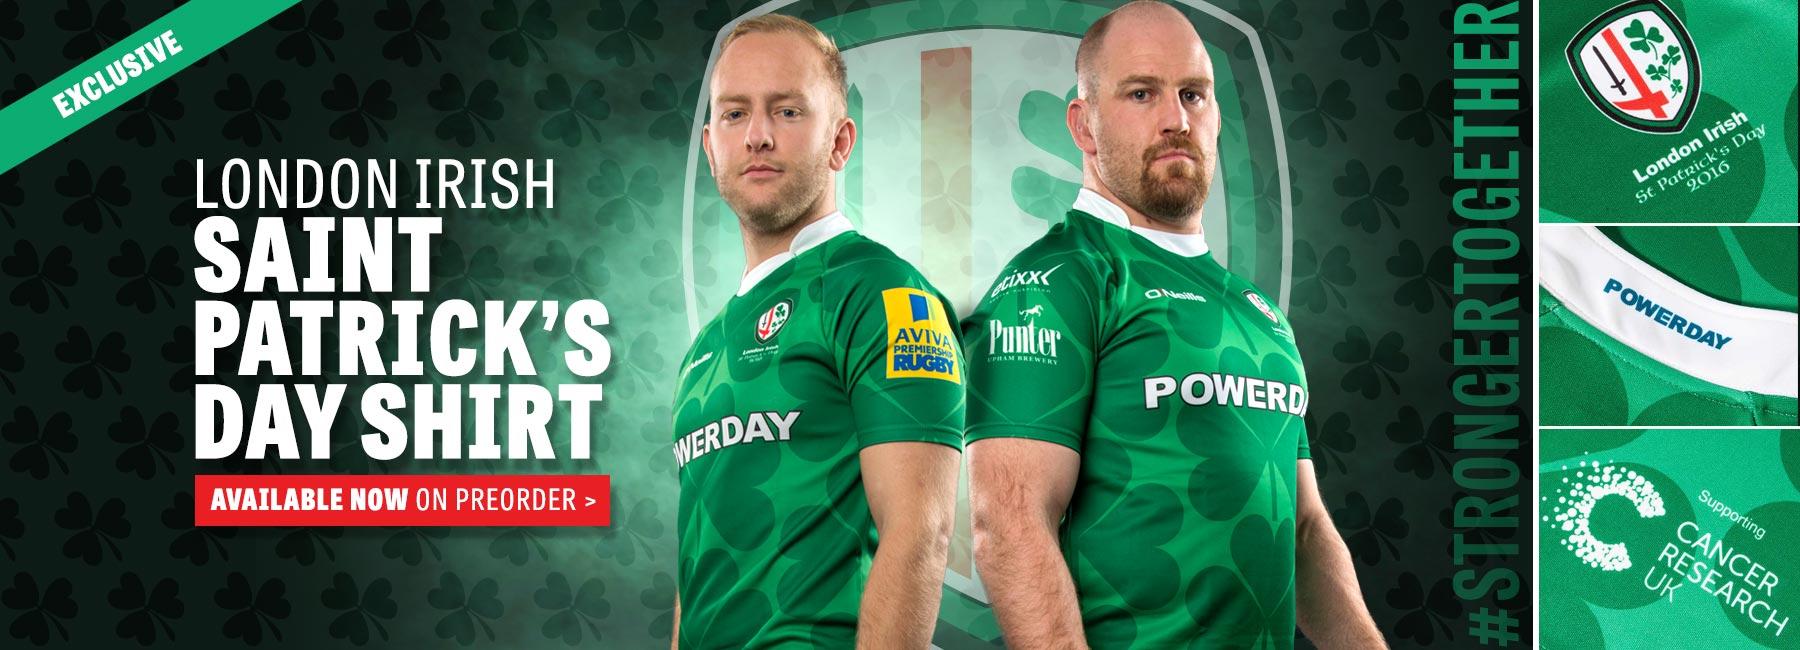 London Irish St Patrick's Day Shirt